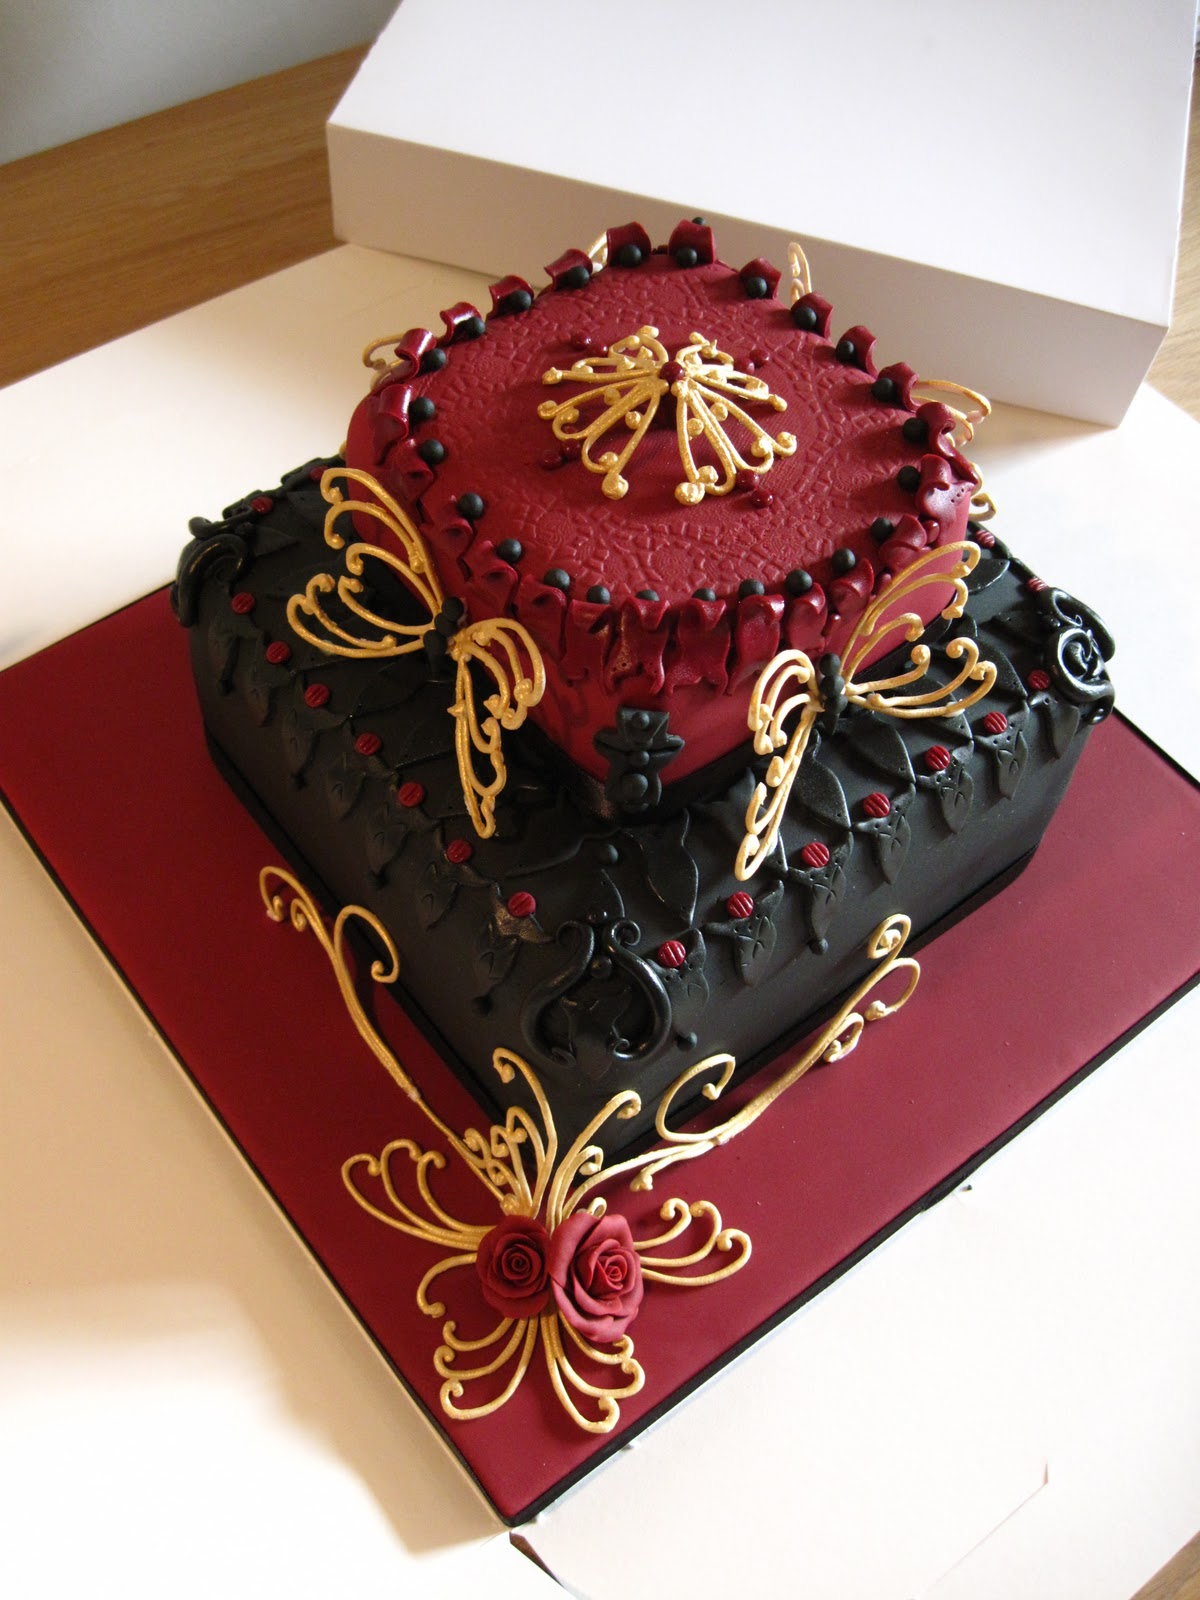 Superb 13 Upscale Birthday Cakes Photo Luxury Birthday Cake For Women Funny Birthday Cards Online Necthendildamsfinfo